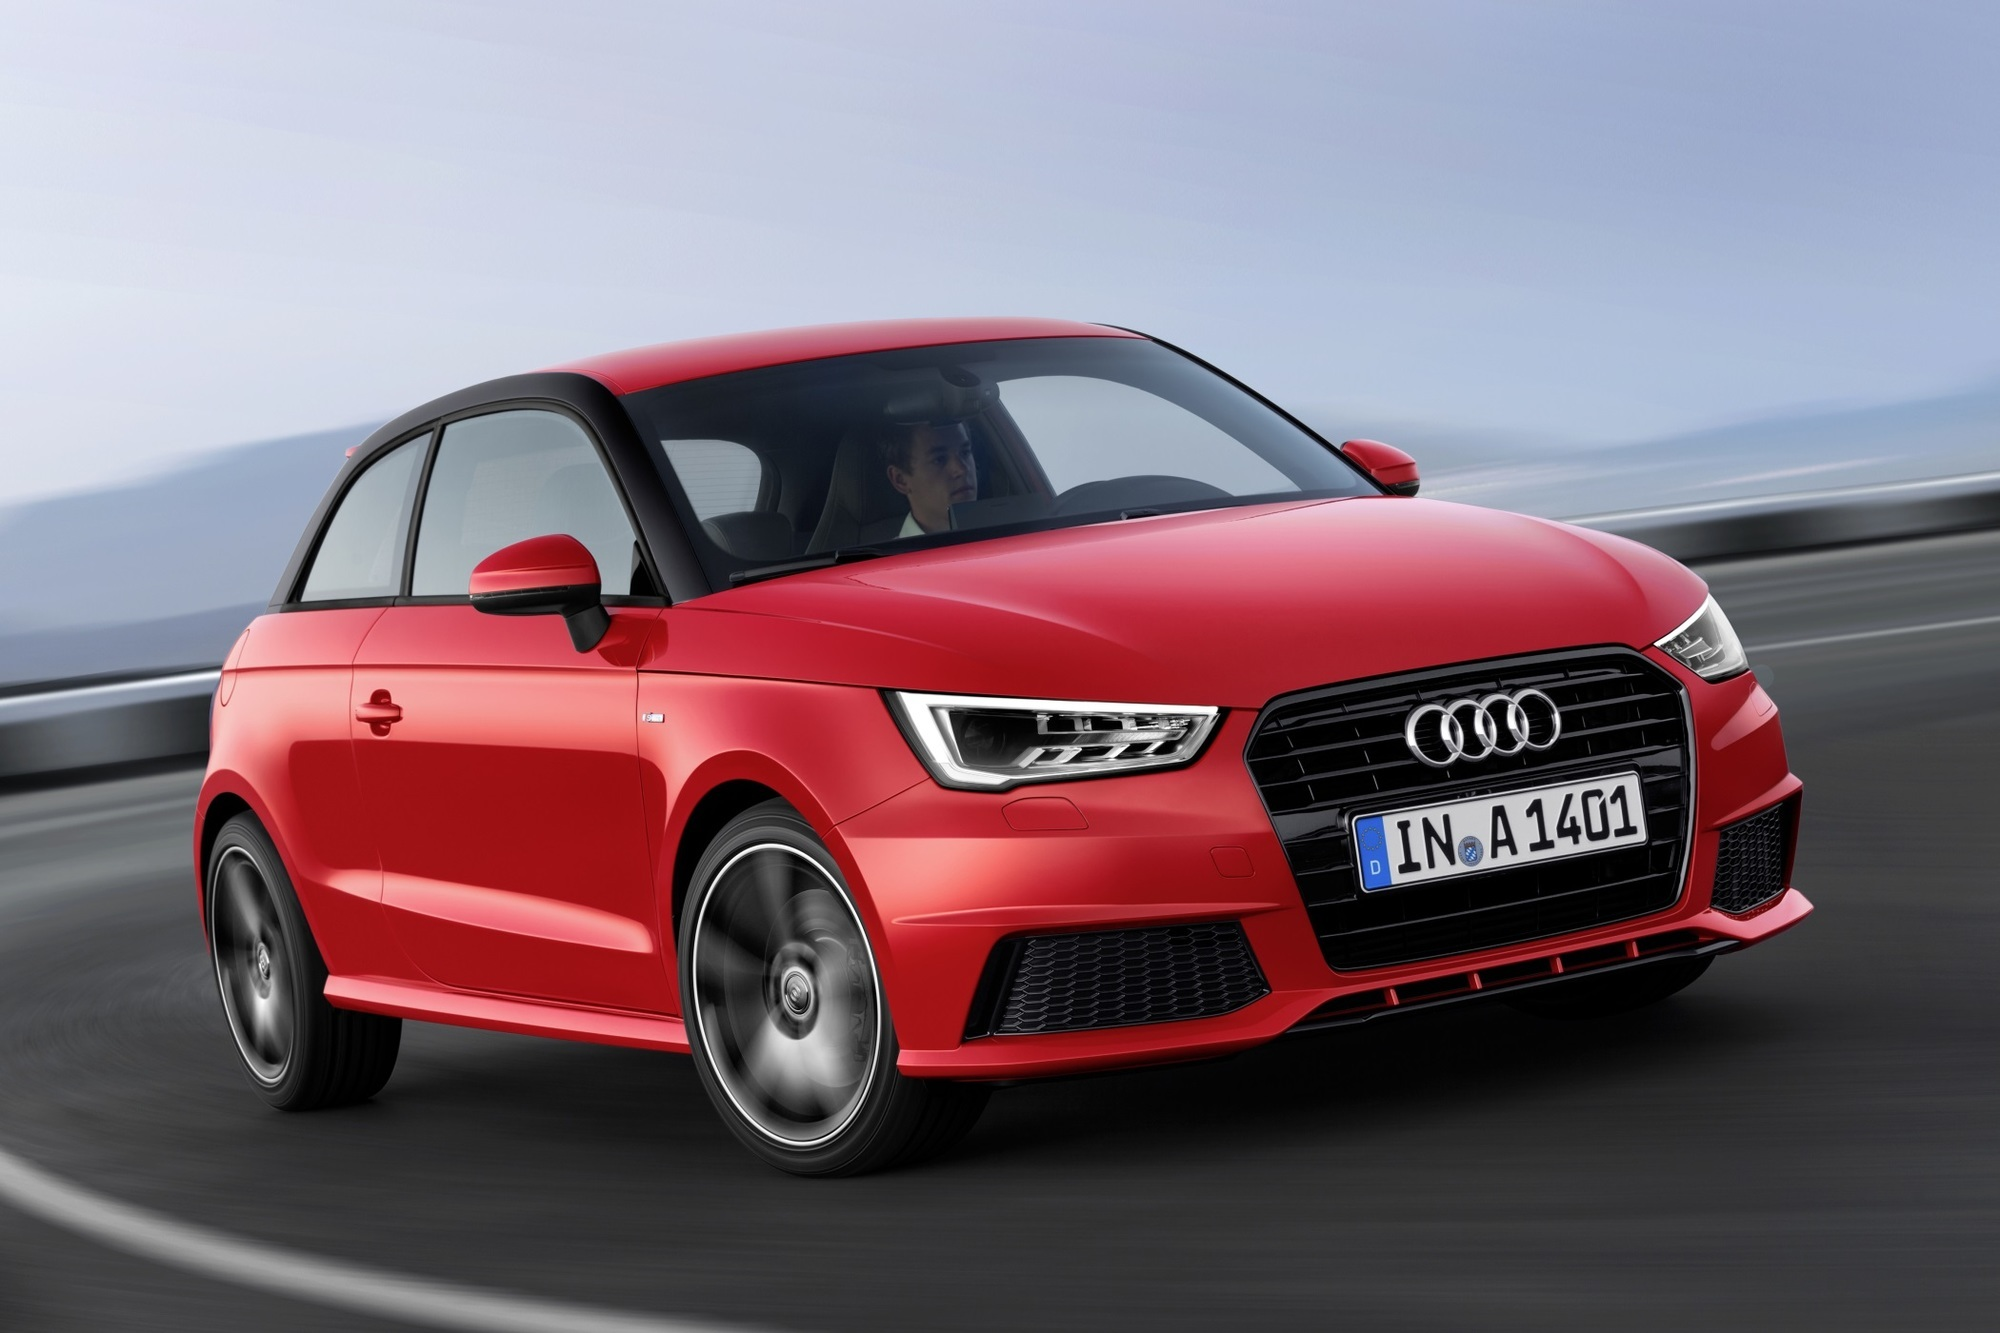 Fahrbericht: Überarbeiteter Audi A1 - Präzise gespart